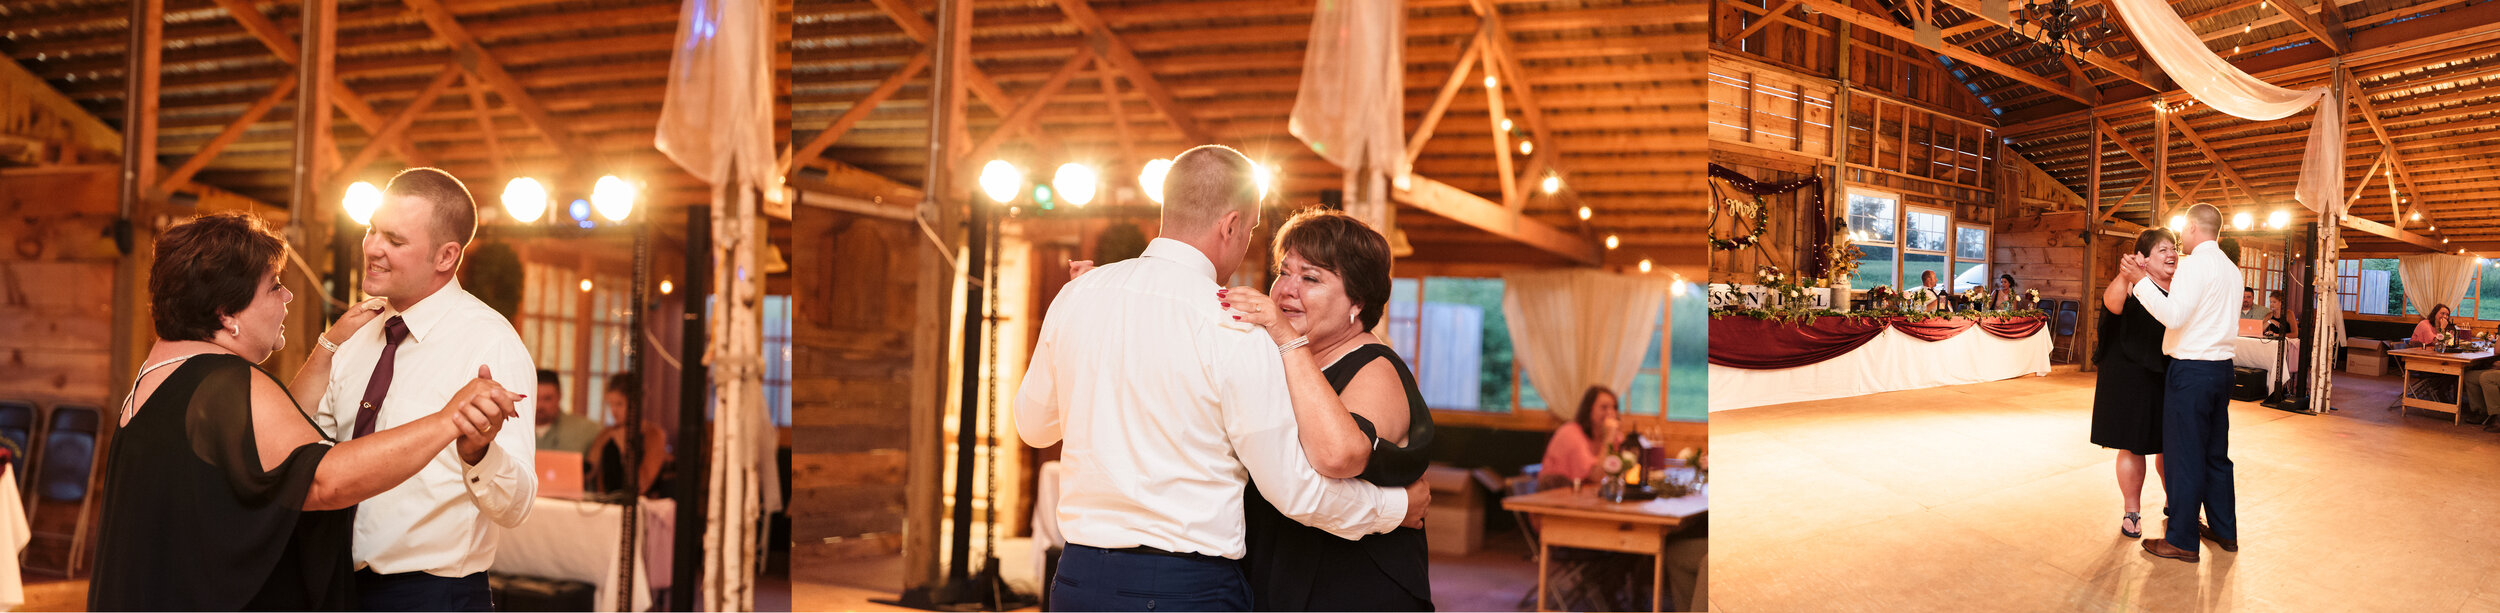 mother son dance.jpg